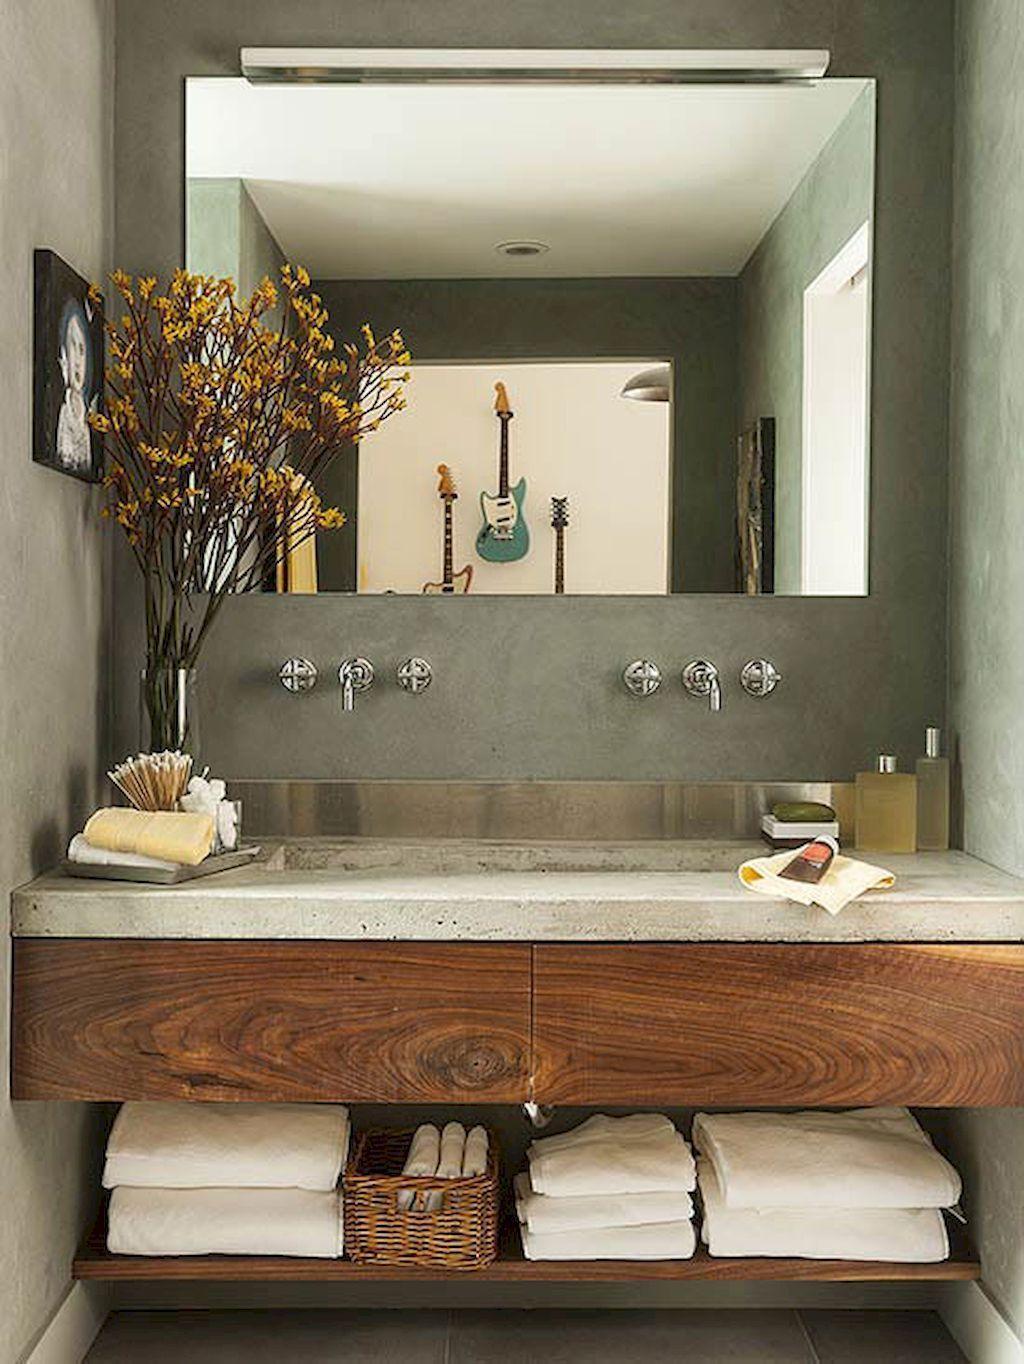 Pin by kelly g moreno on bathroom remodel pinterest bathroom